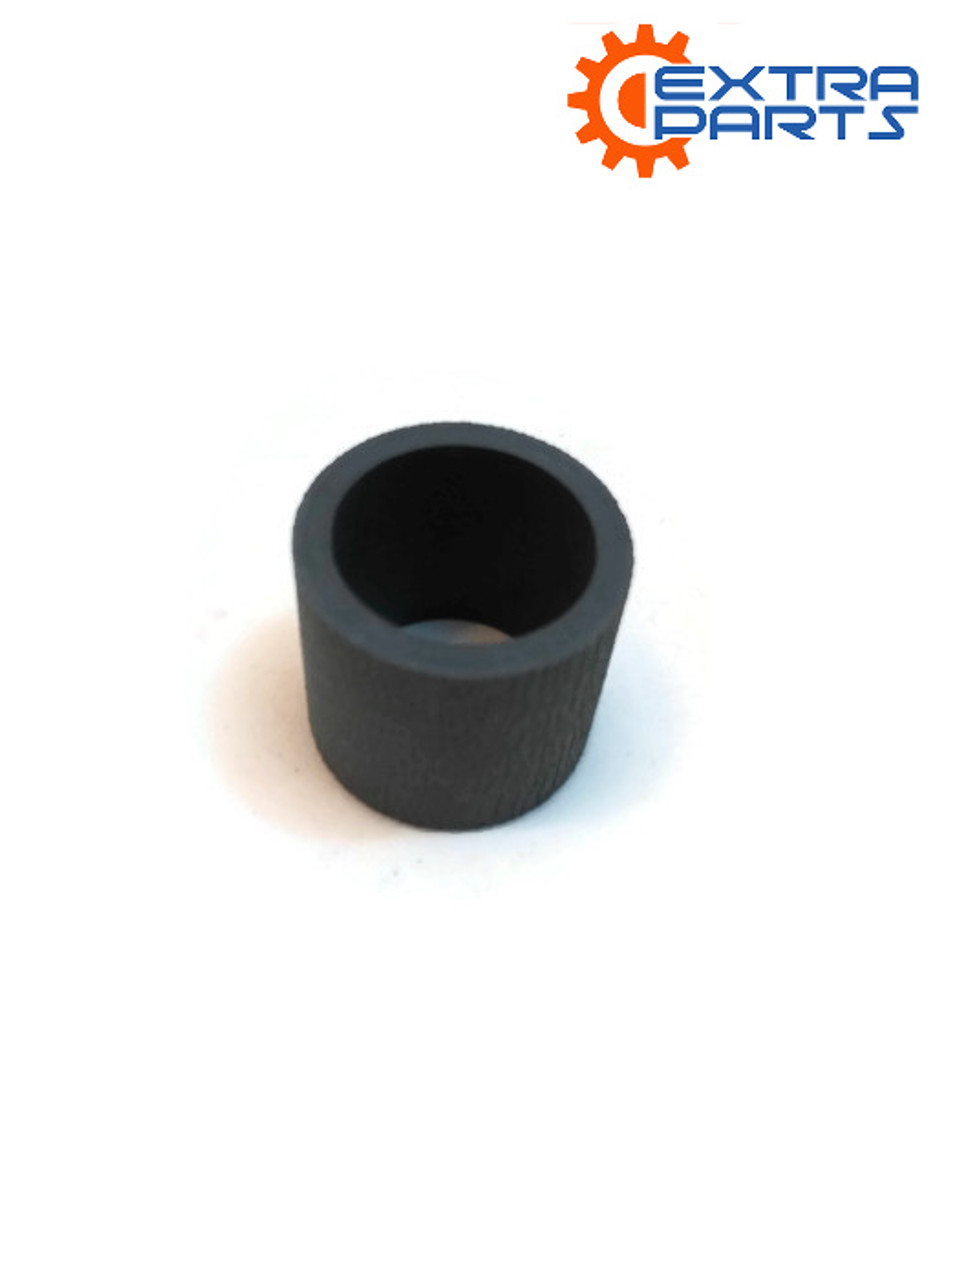 Feed Roller Tire for HP Officejet Pro 8100 8000 8600 Pro X451 X551 X476  X576 251dw 276dw 8610 8620 8630 8640 M0603501